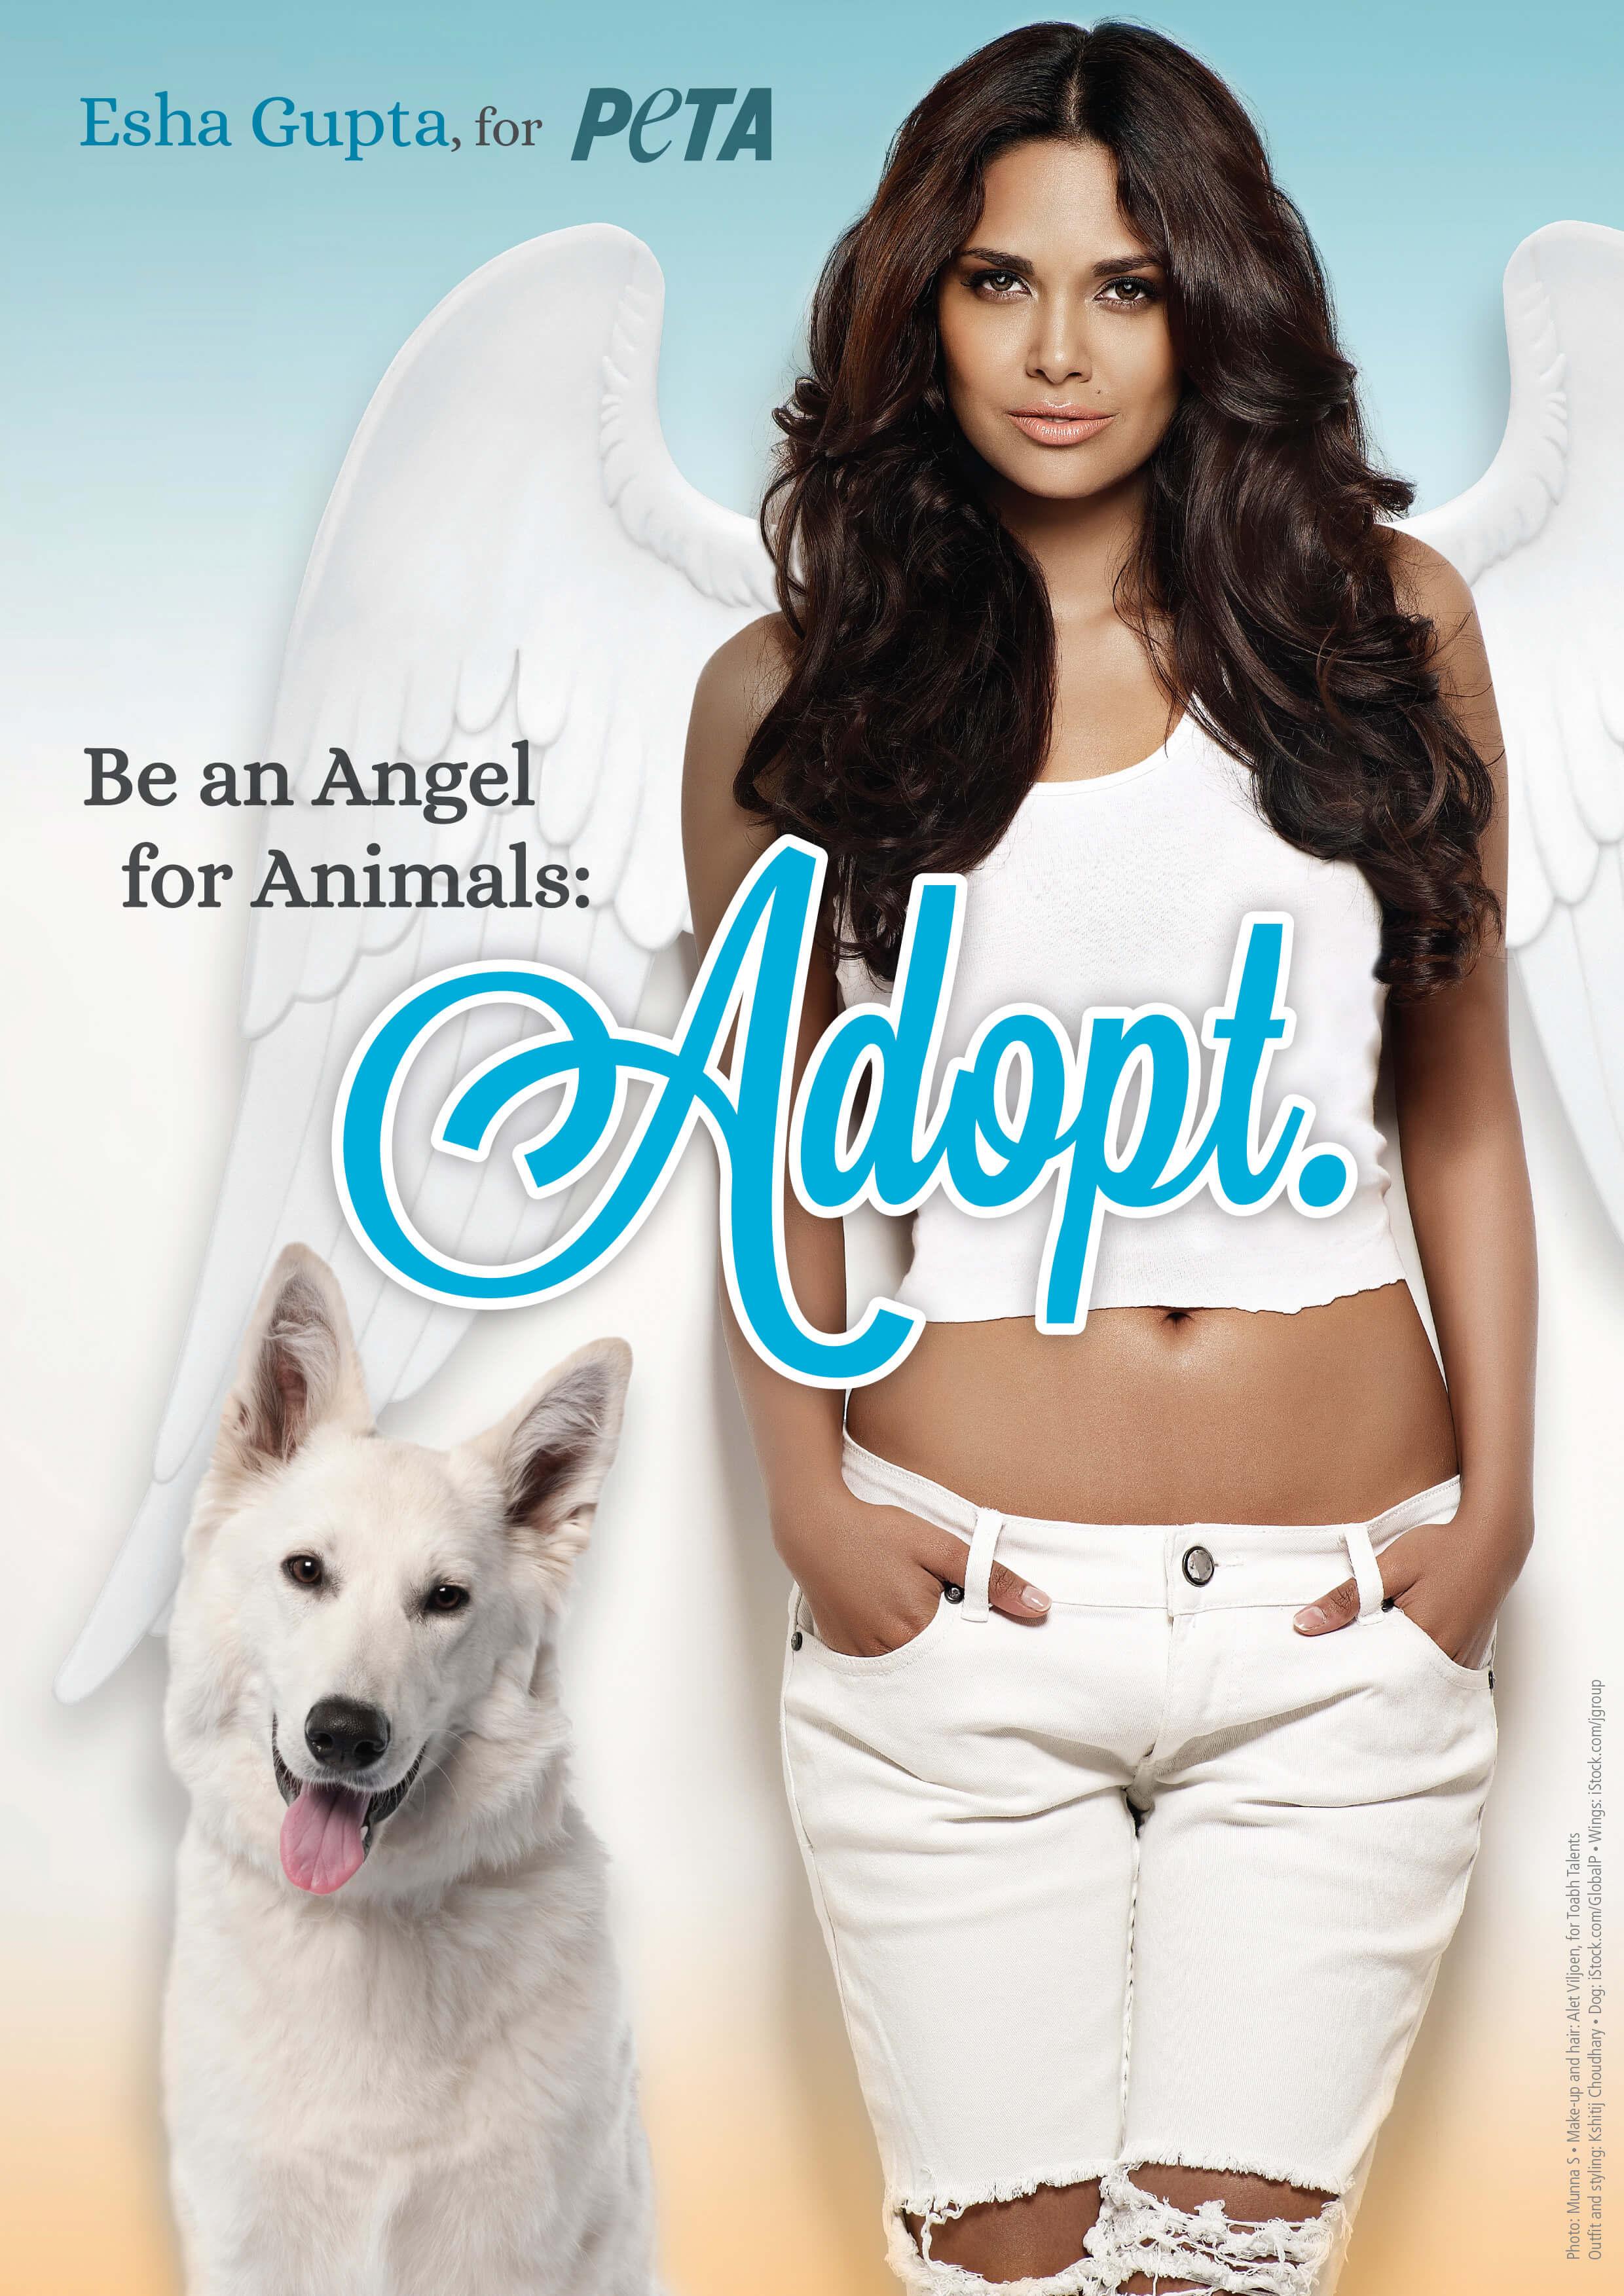 Esha Gupta Is a Guardian Angel for Animals